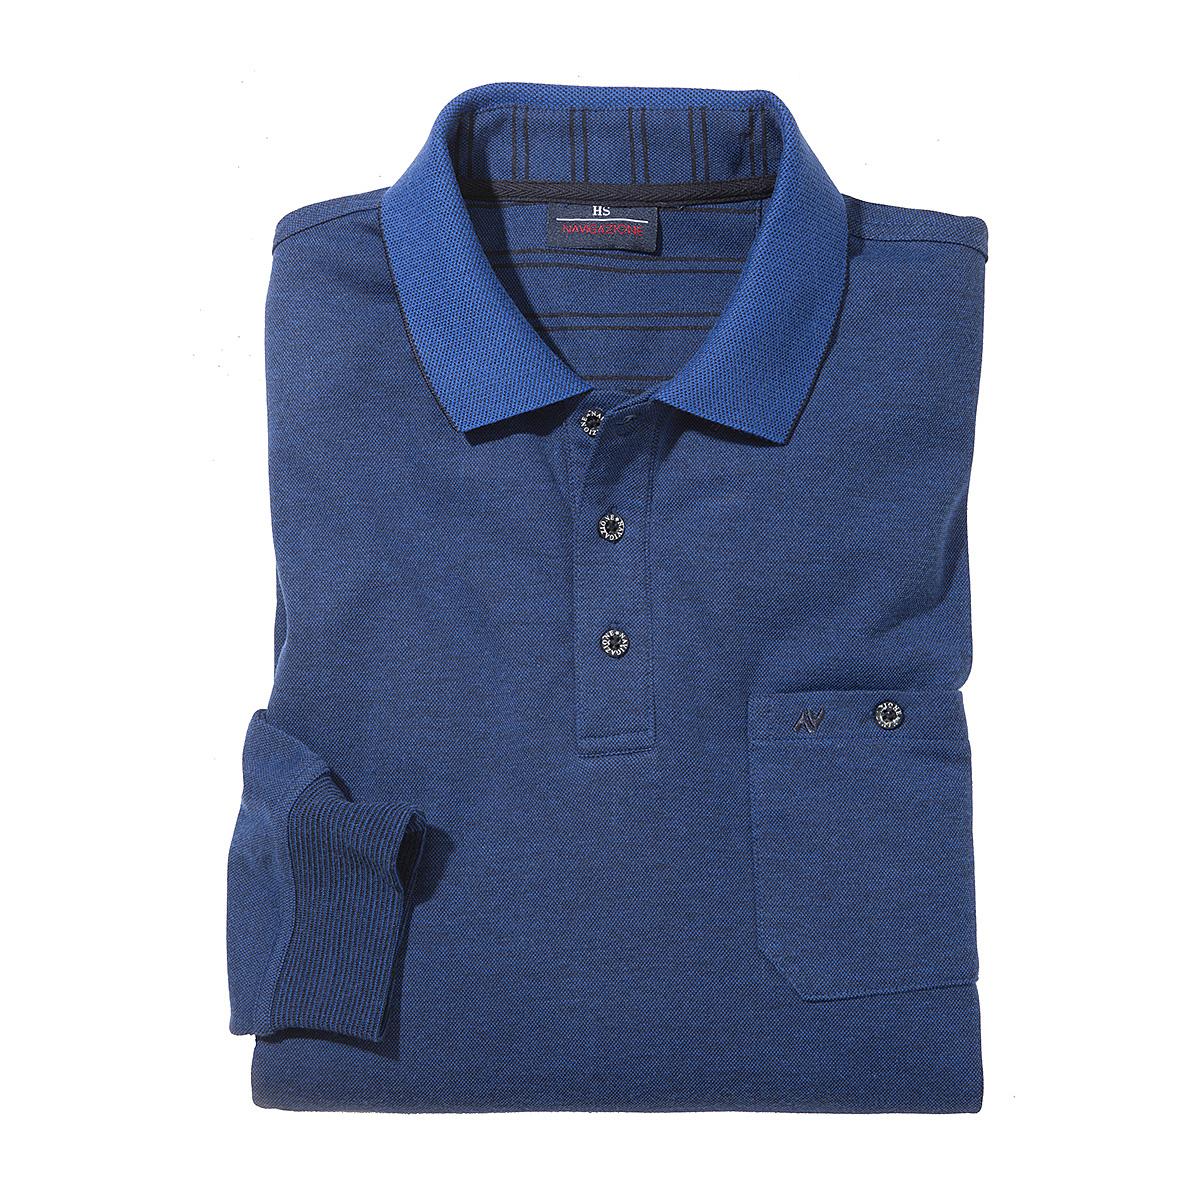 jersey hemd easy care mit polo kragen farbe royal. Black Bedroom Furniture Sets. Home Design Ideas